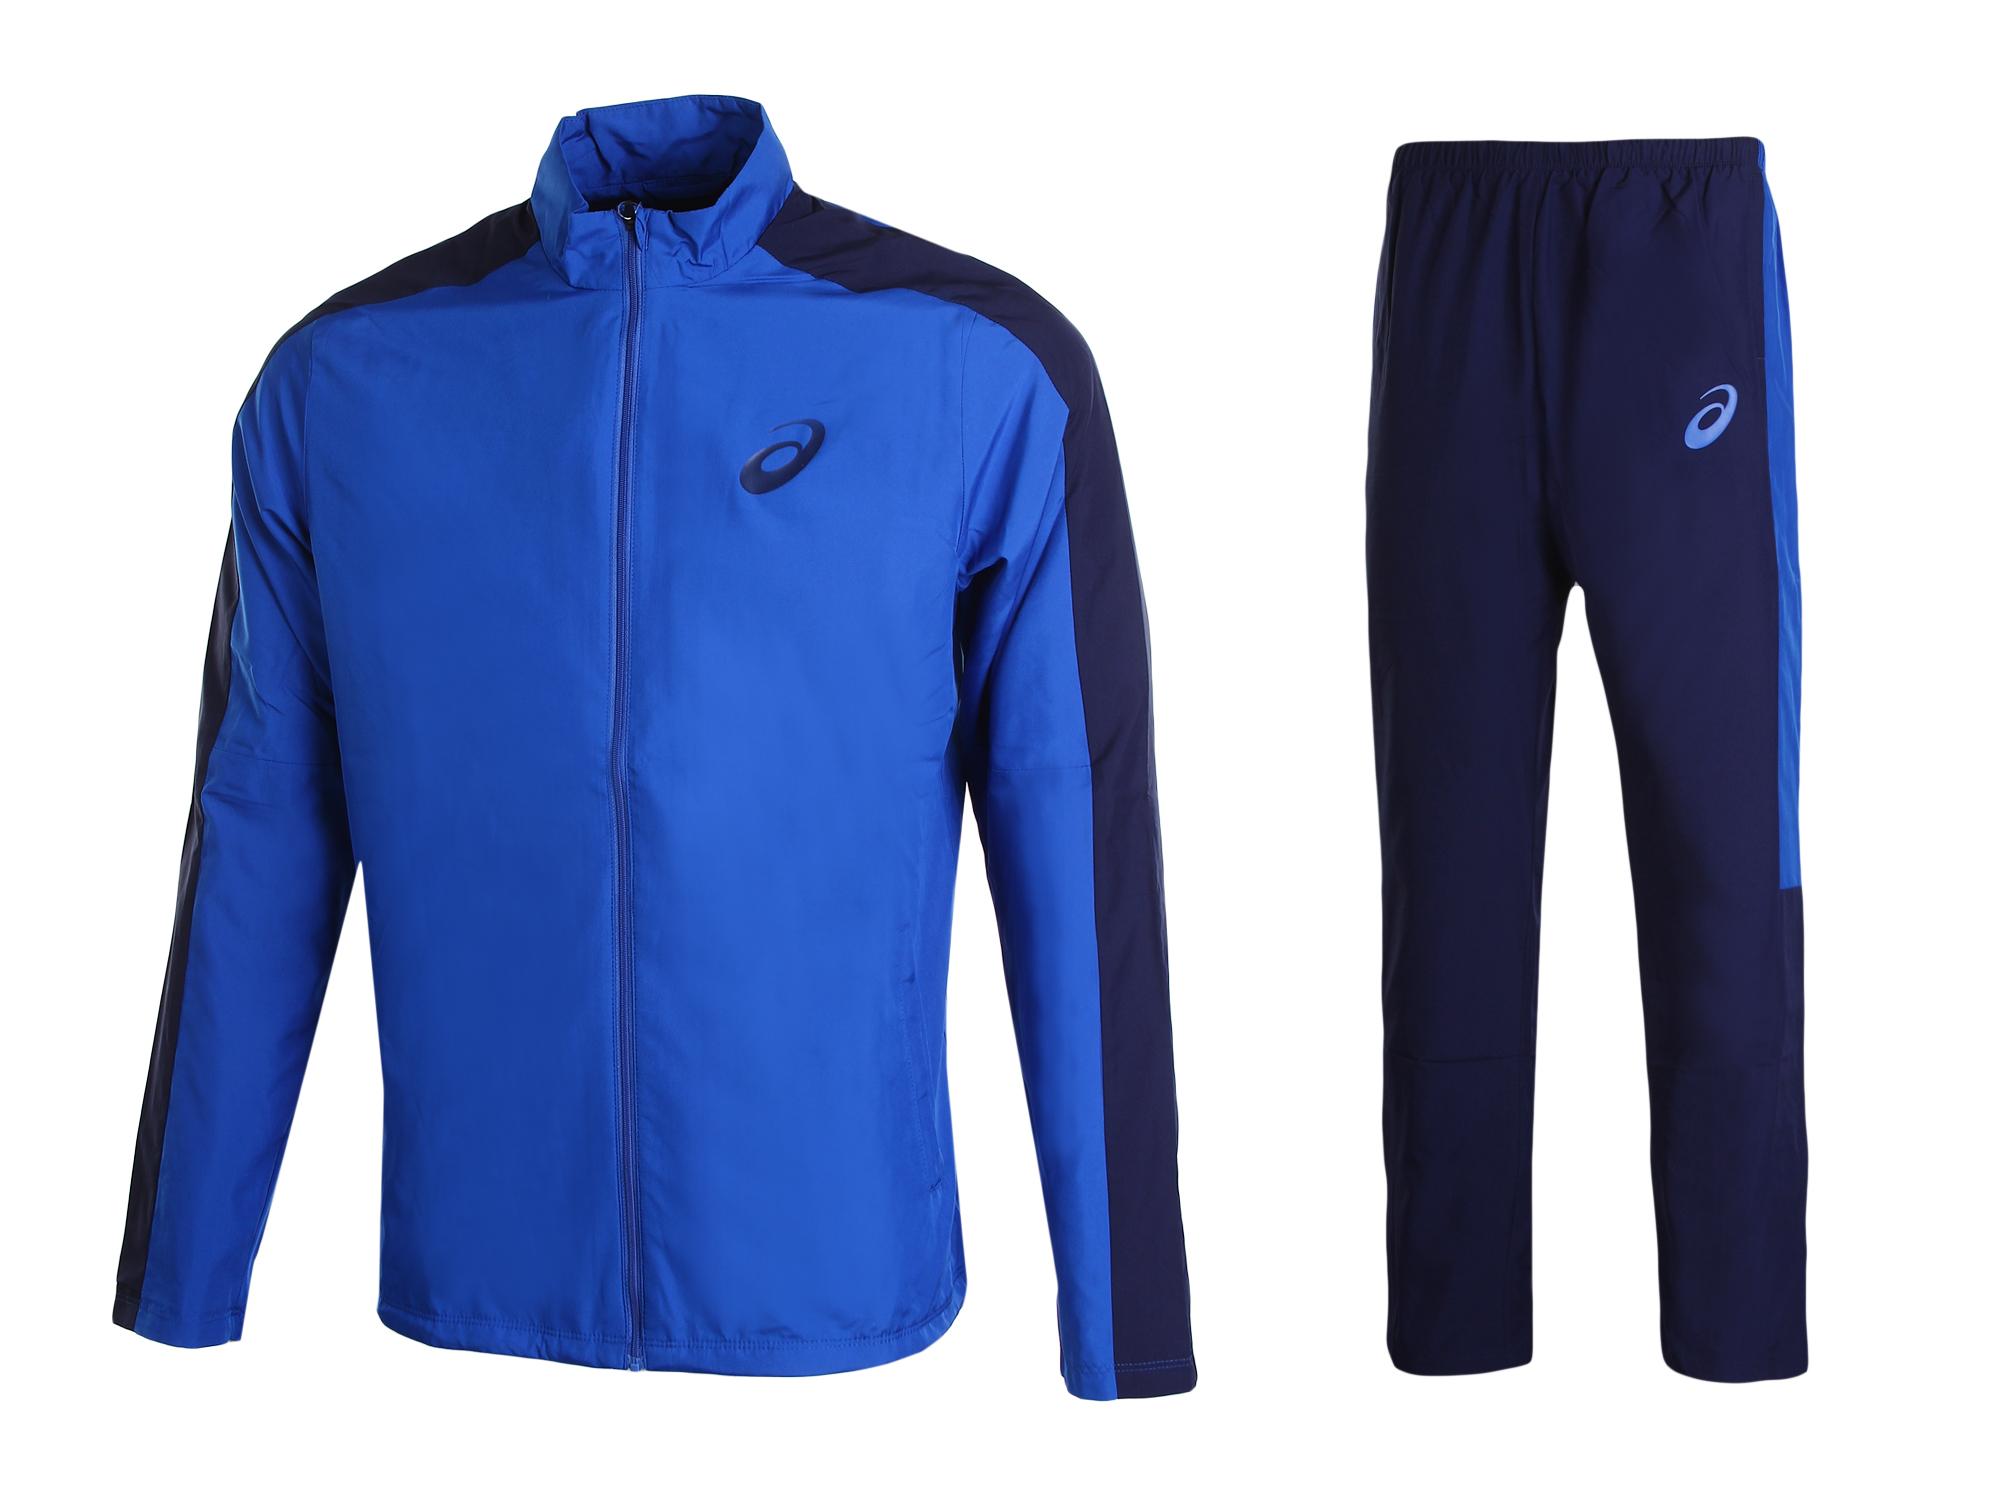 Спортивный костюм Asics Lined Suit, blue/peacoat, XXL INT Lined Suit по цене 5 190